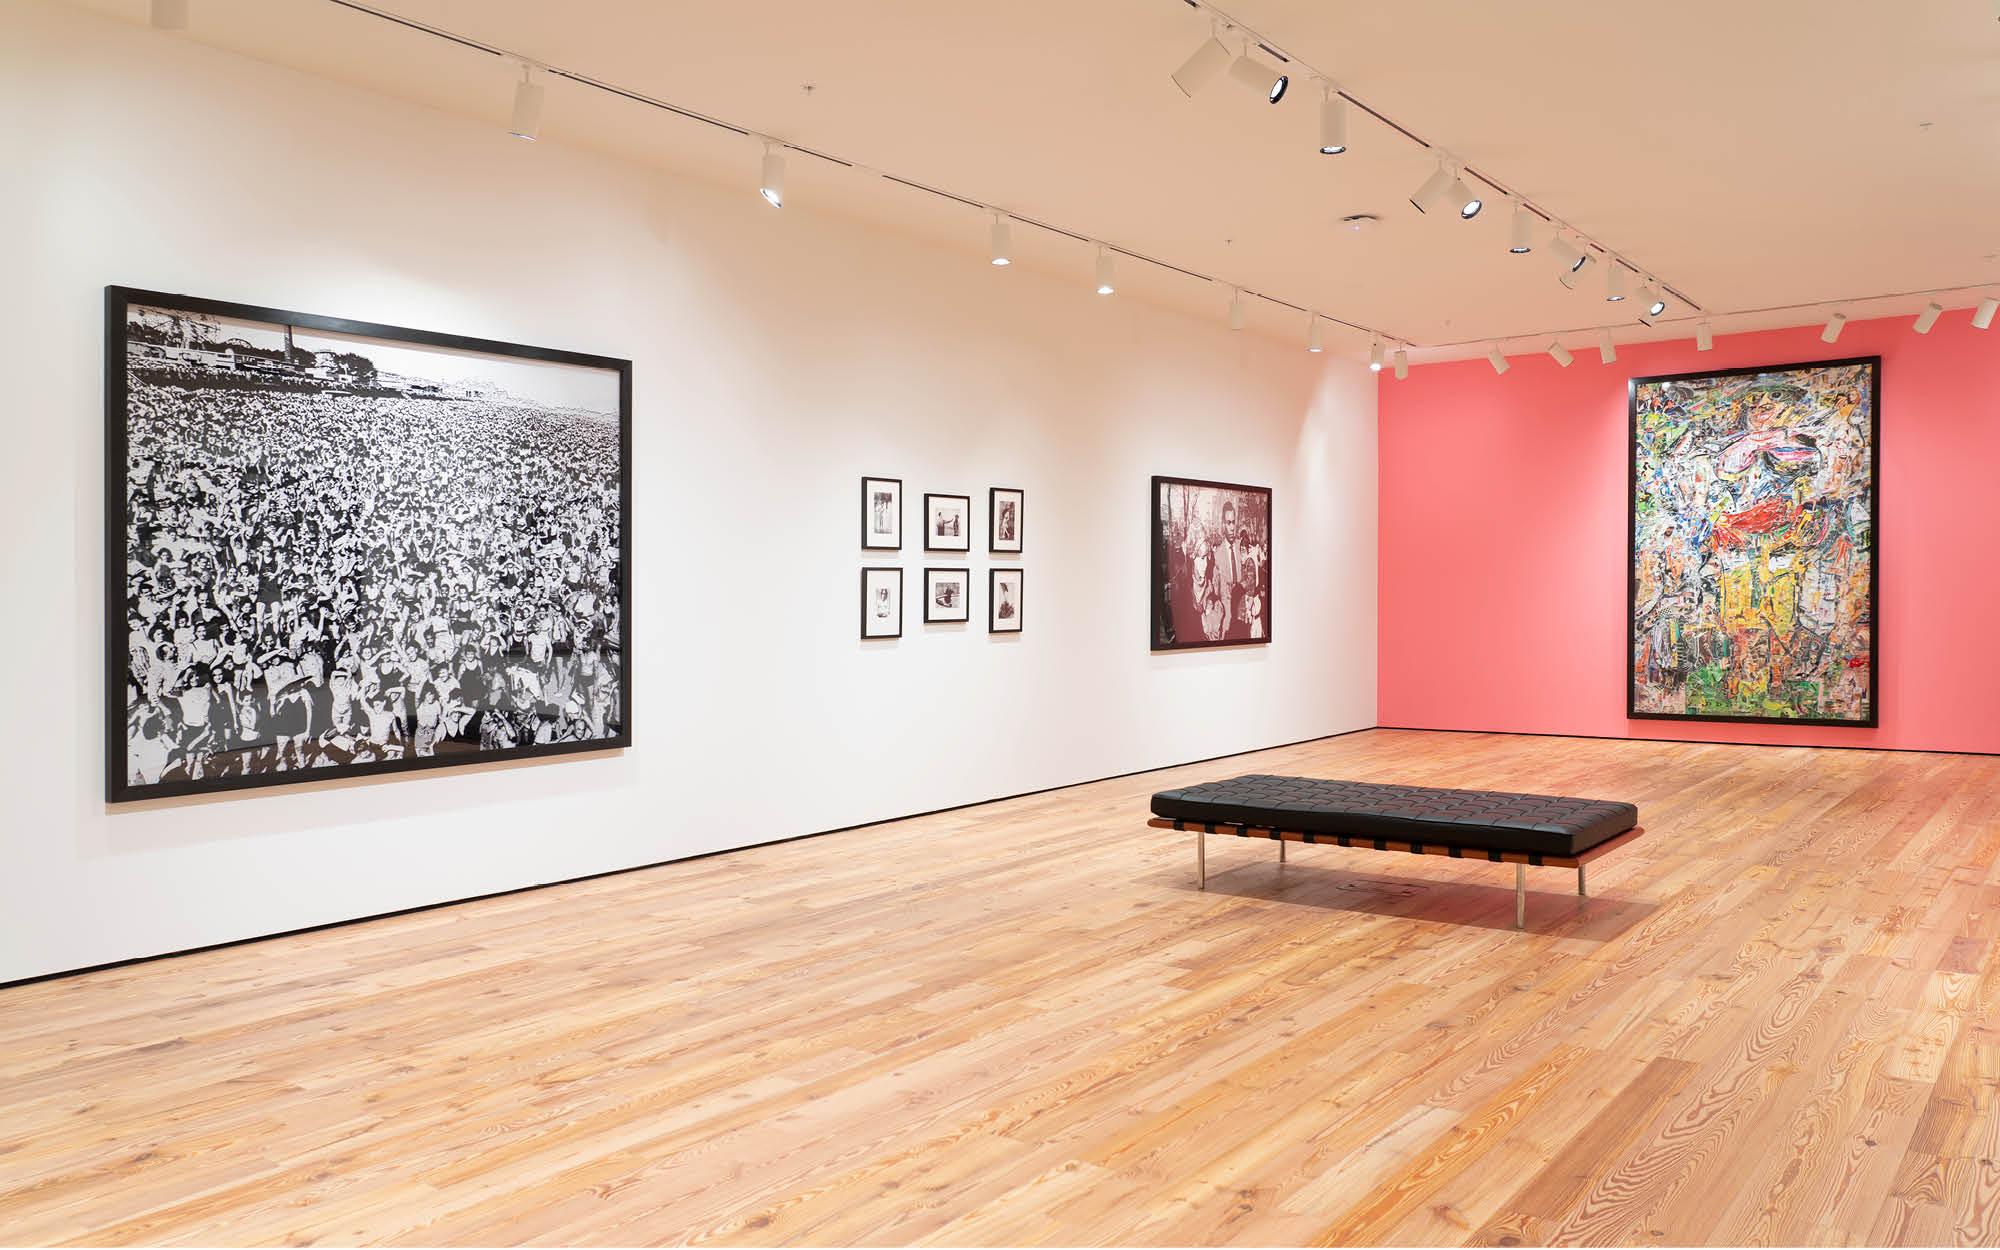 Vik Muniz exhibition, Richard and Barbara Basch Gallery, Sarasota Art Museum